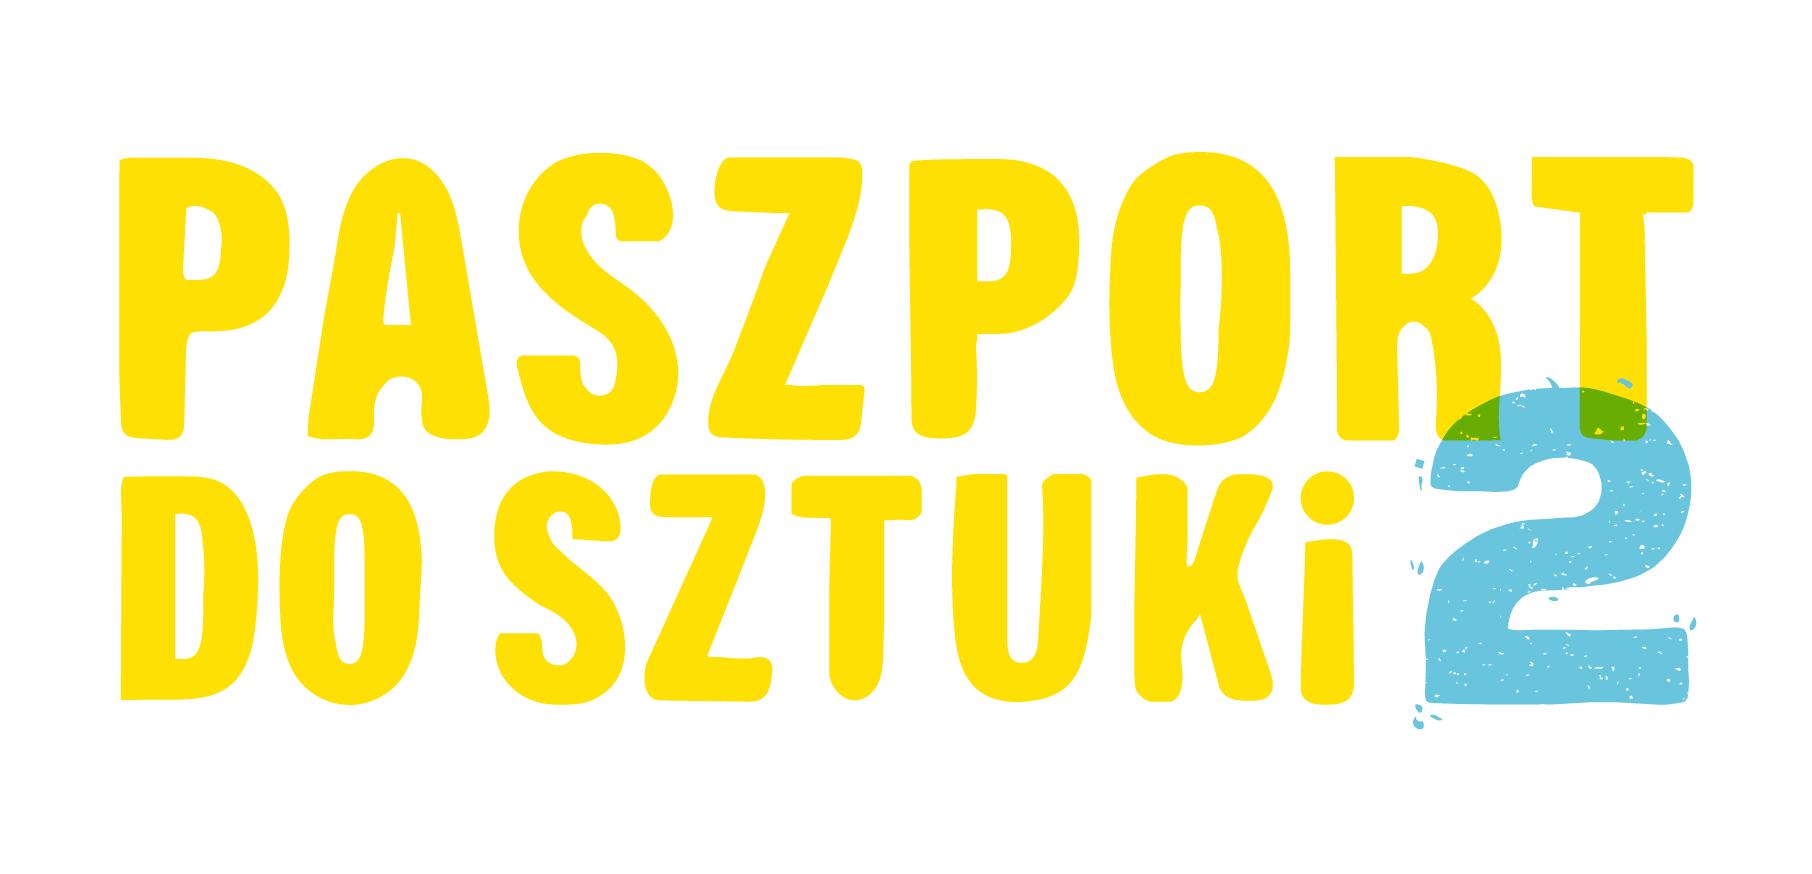 logo projektu Paszport do sztuki